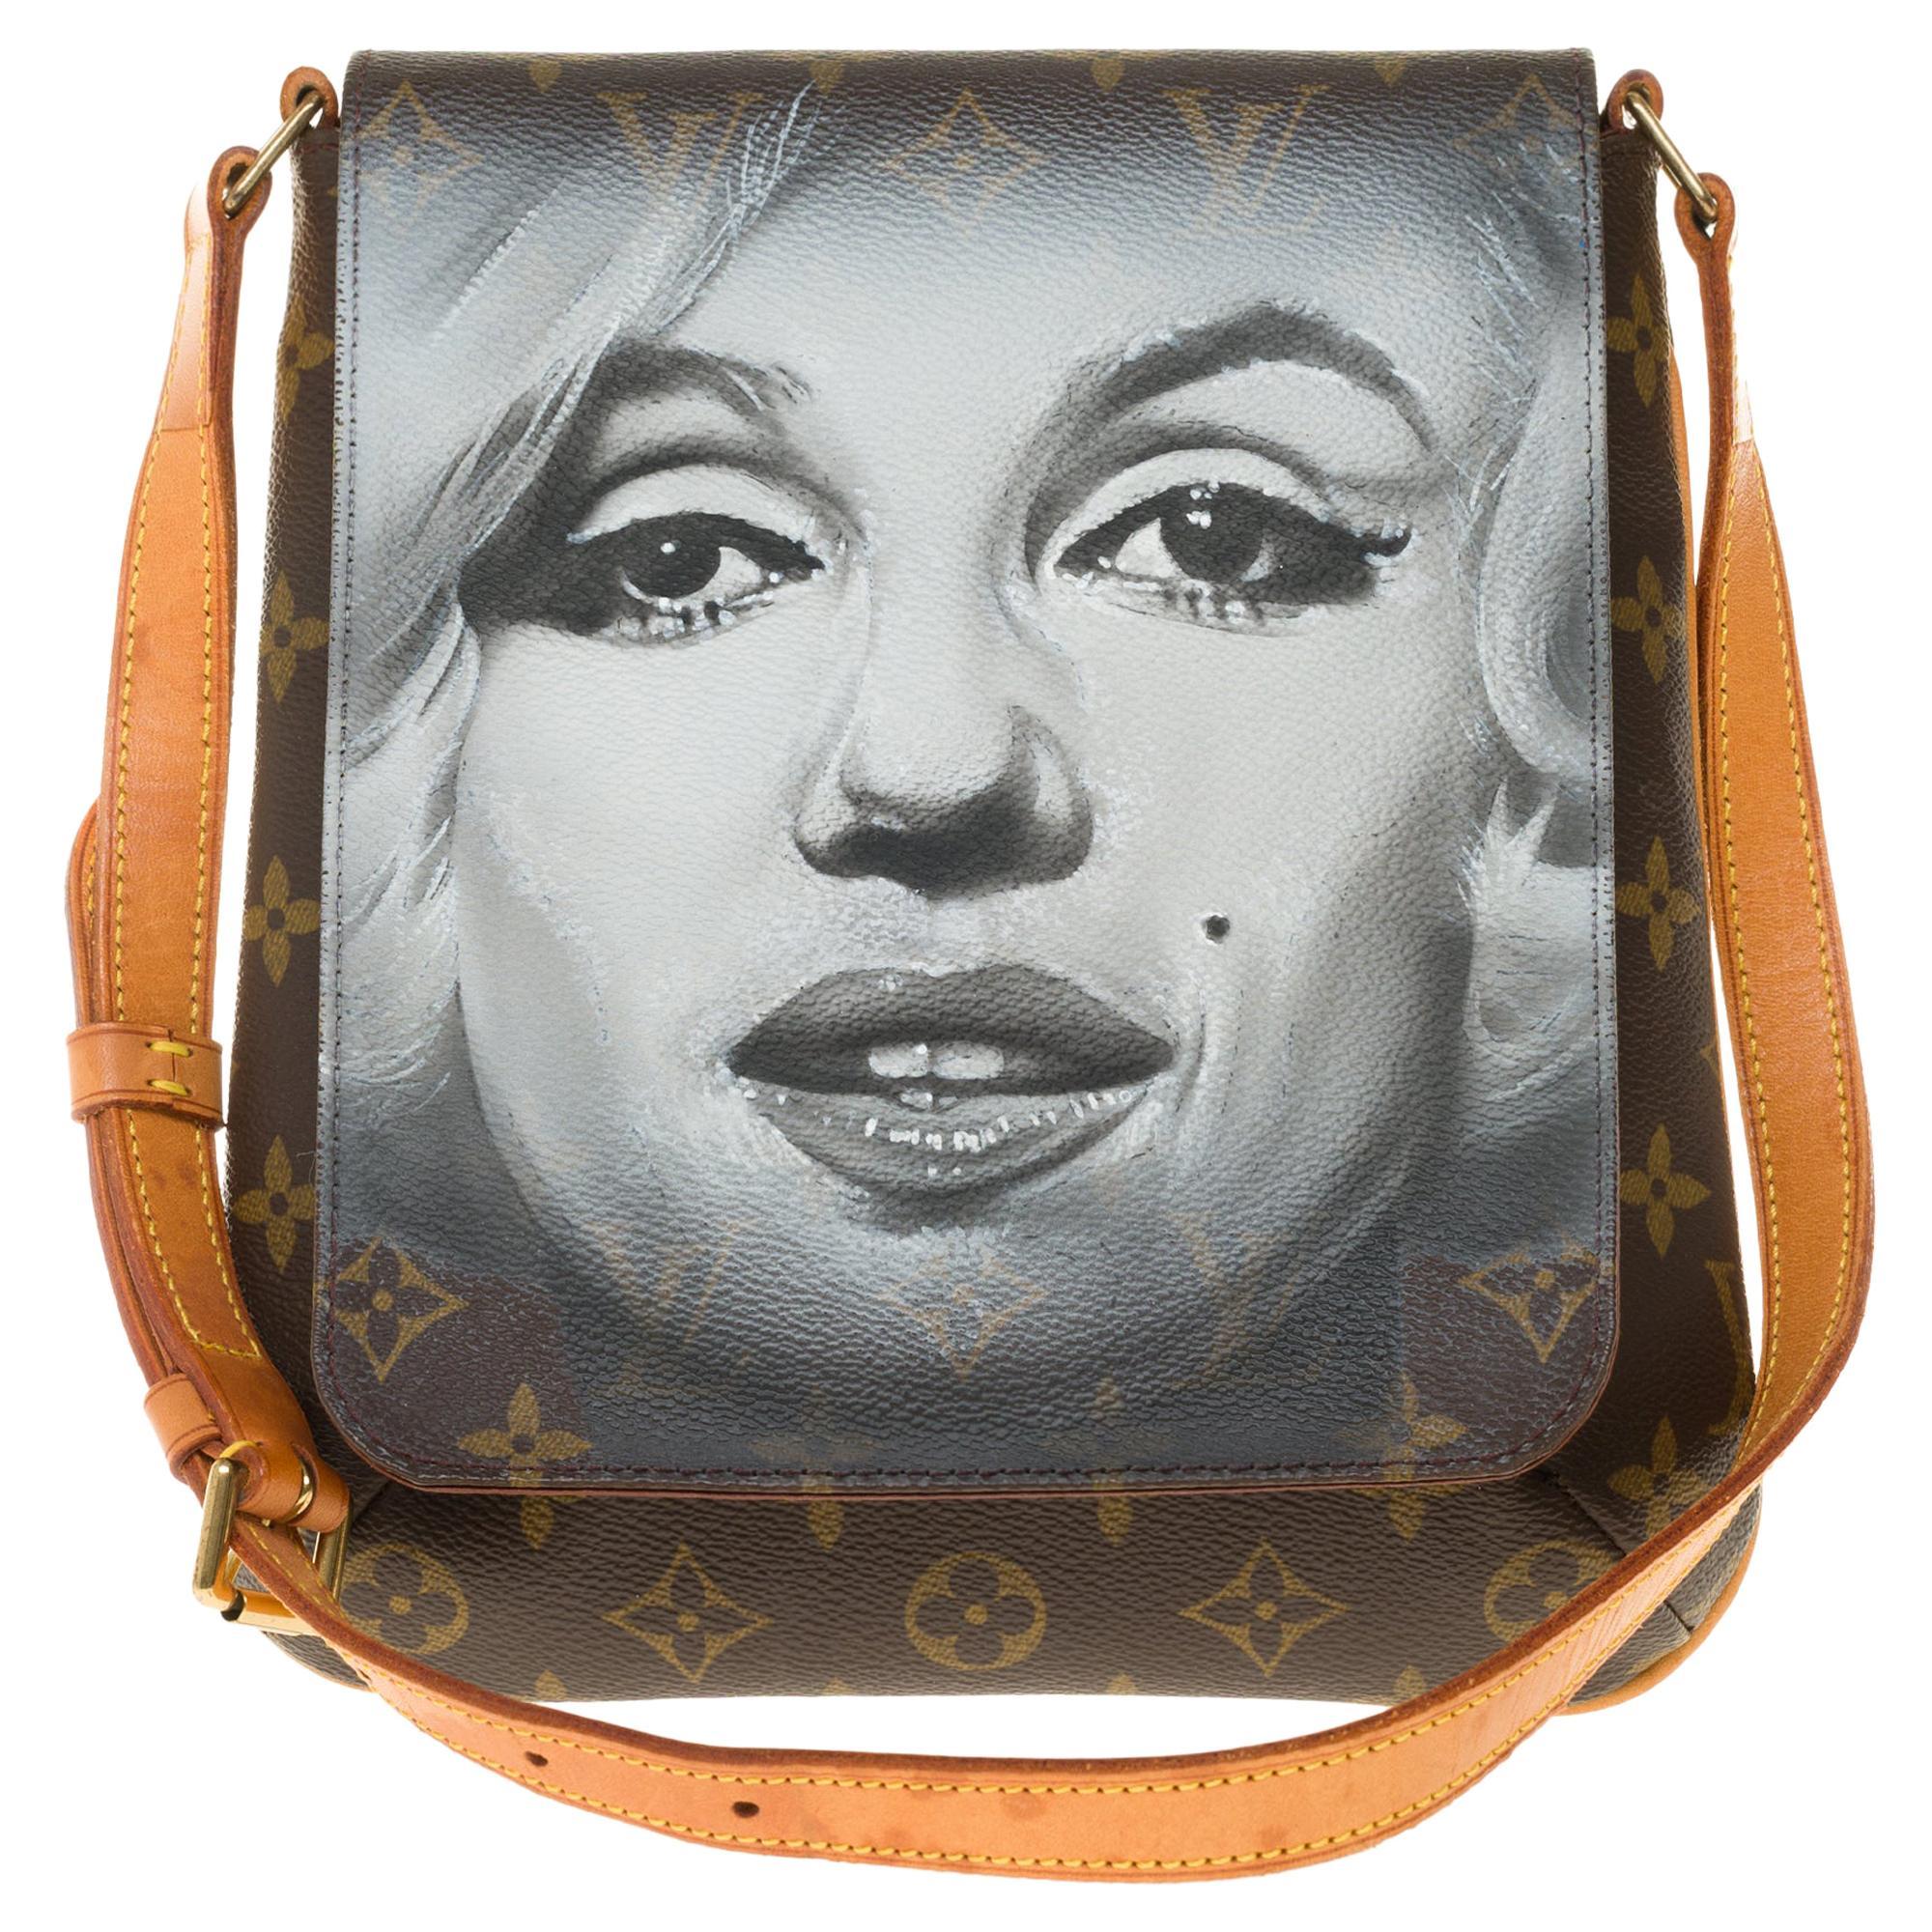 "LV Musette Salsa shoulder bag in Monogram canvas customized ""Marilyn"""